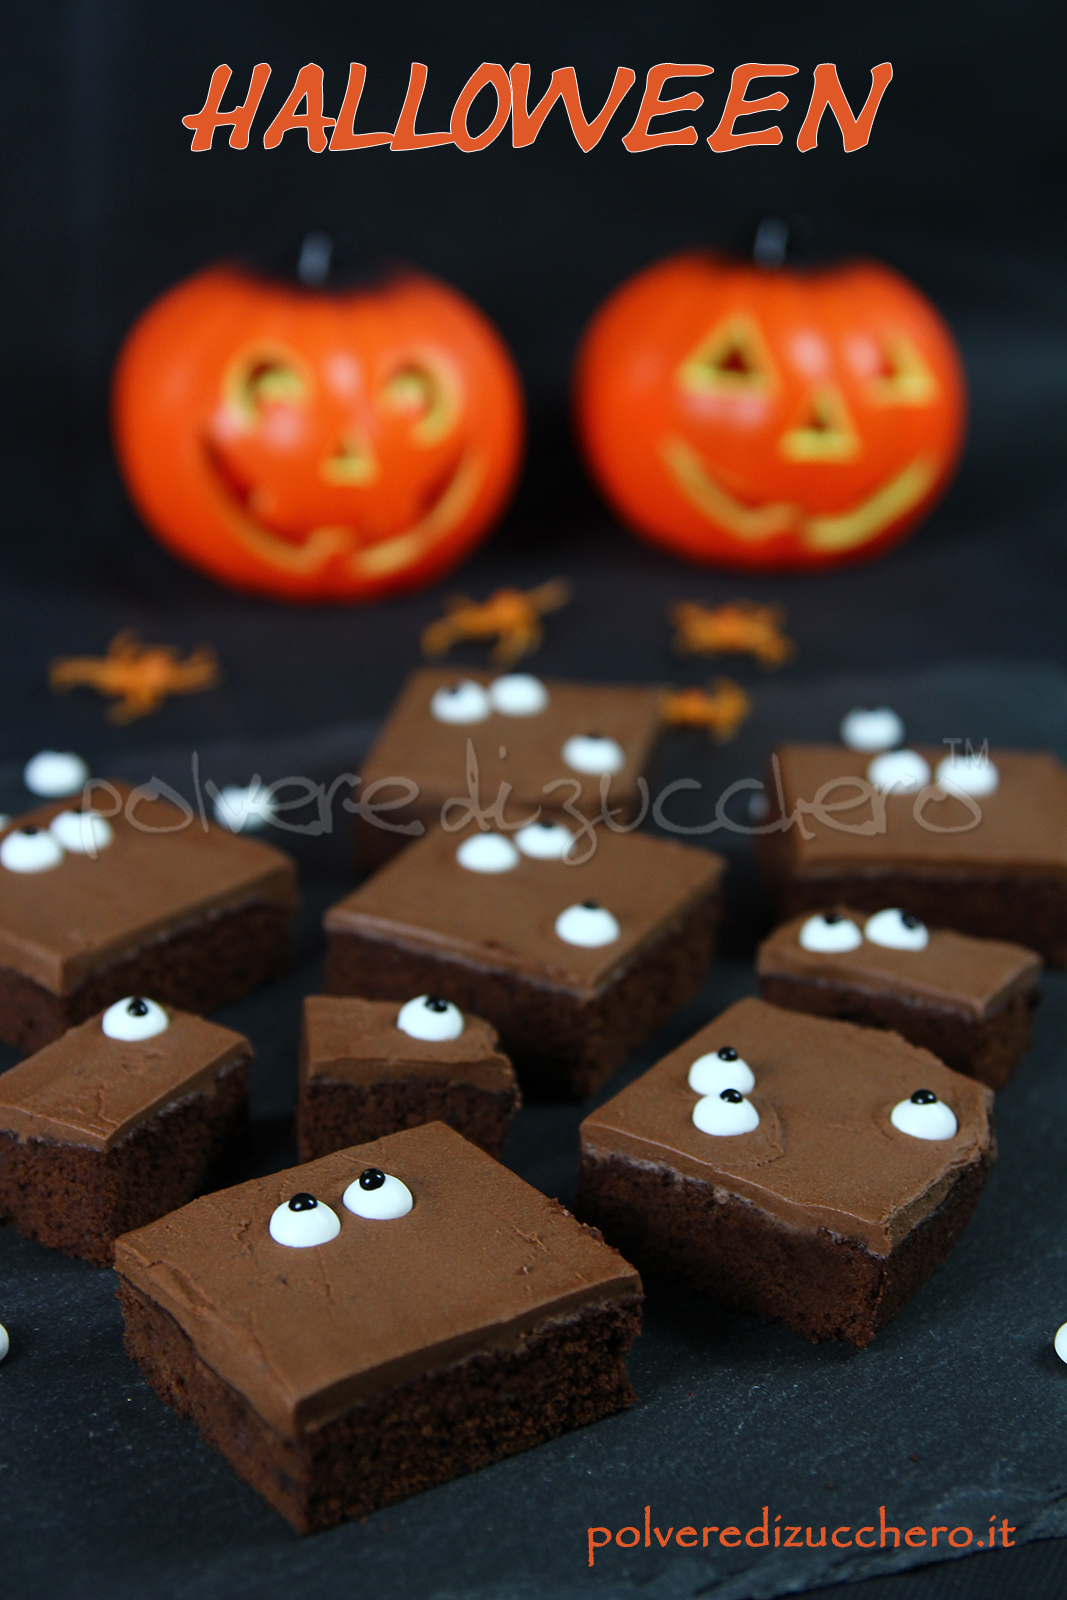 halloween cake chocolate torta cioccolato a quadrotti spooky eyes cake  design polvere di zucchero 50ed891a61e4